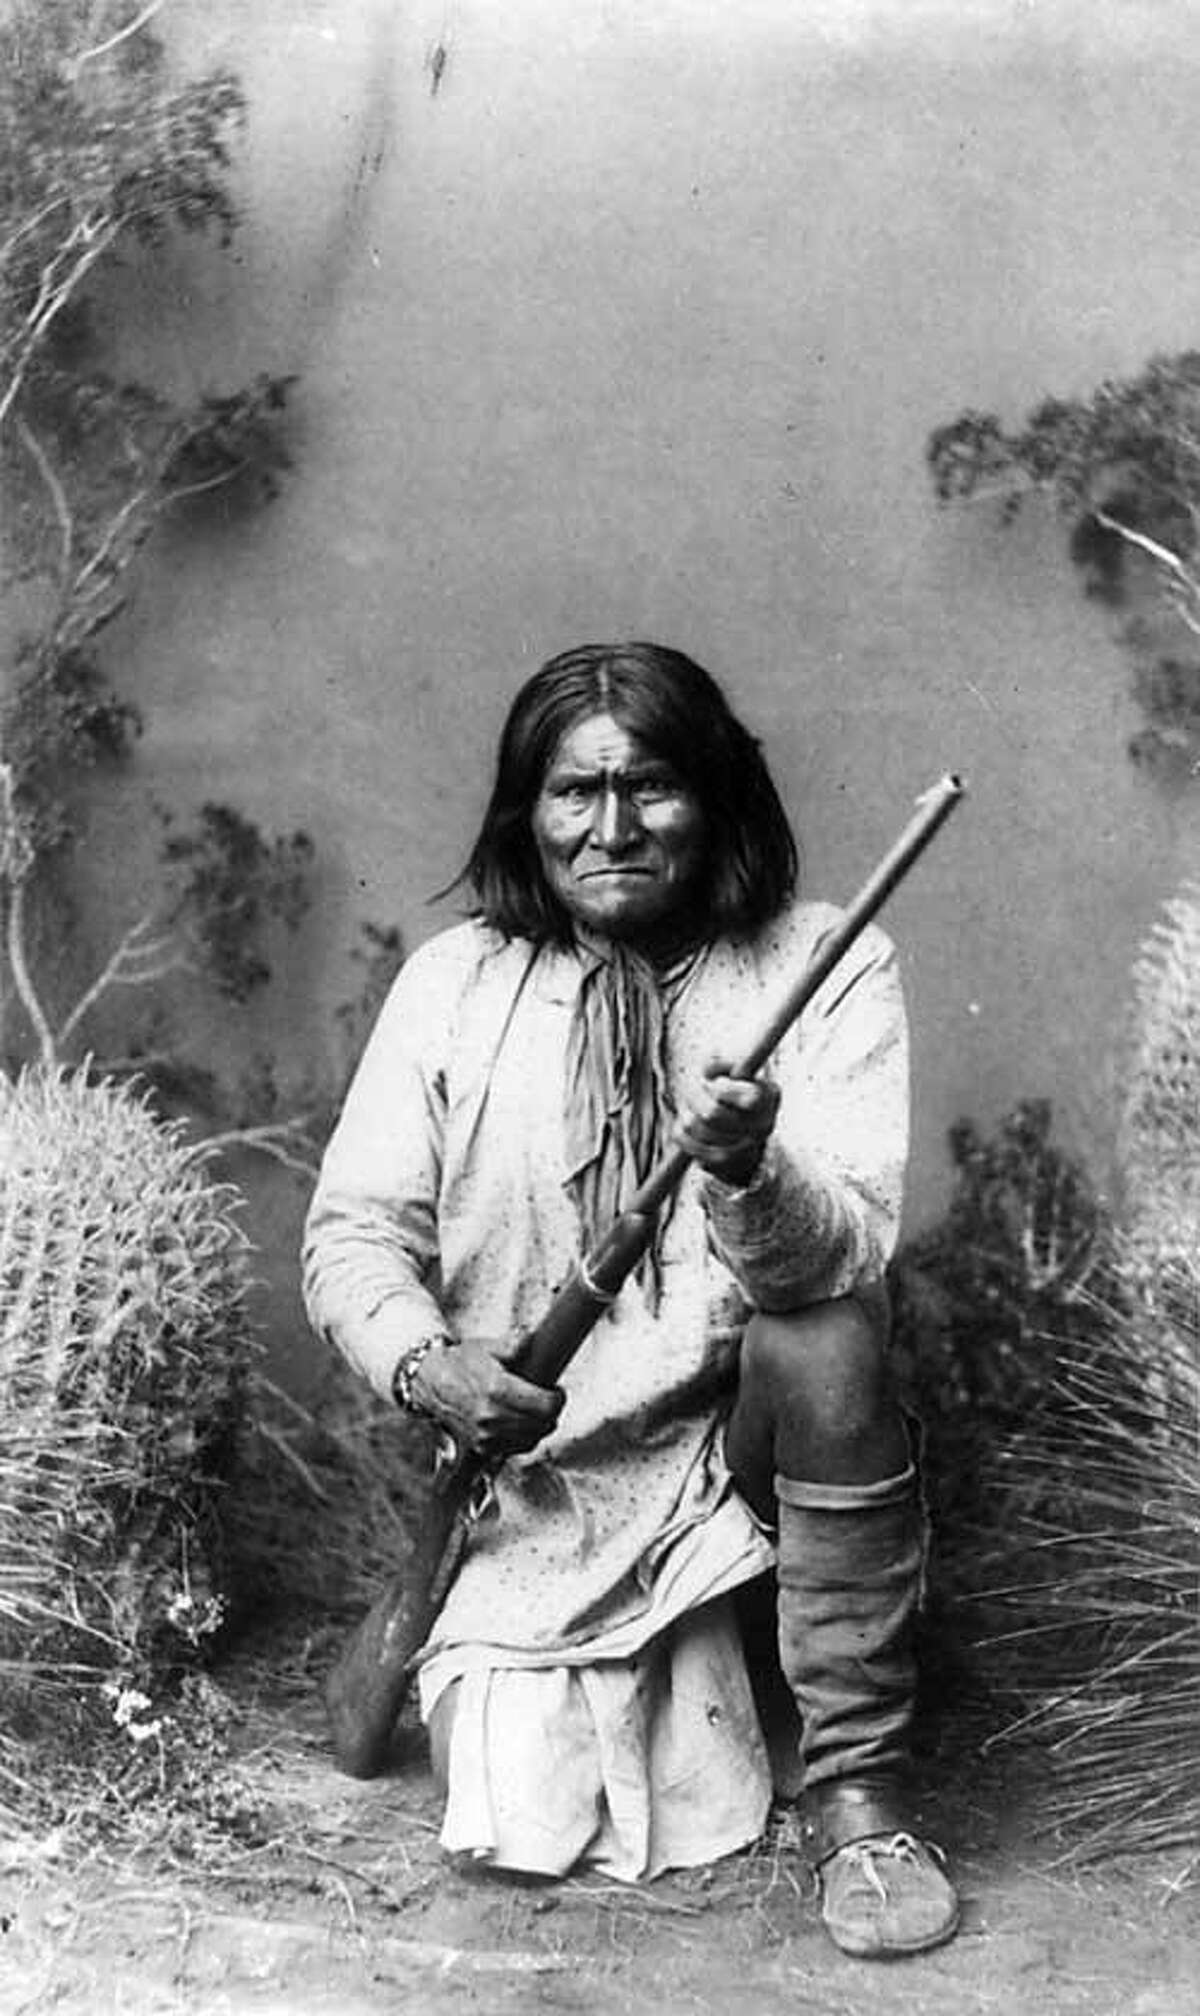 Geronimo, a Bedonkohe Apache, kneeling with rifle, 1887